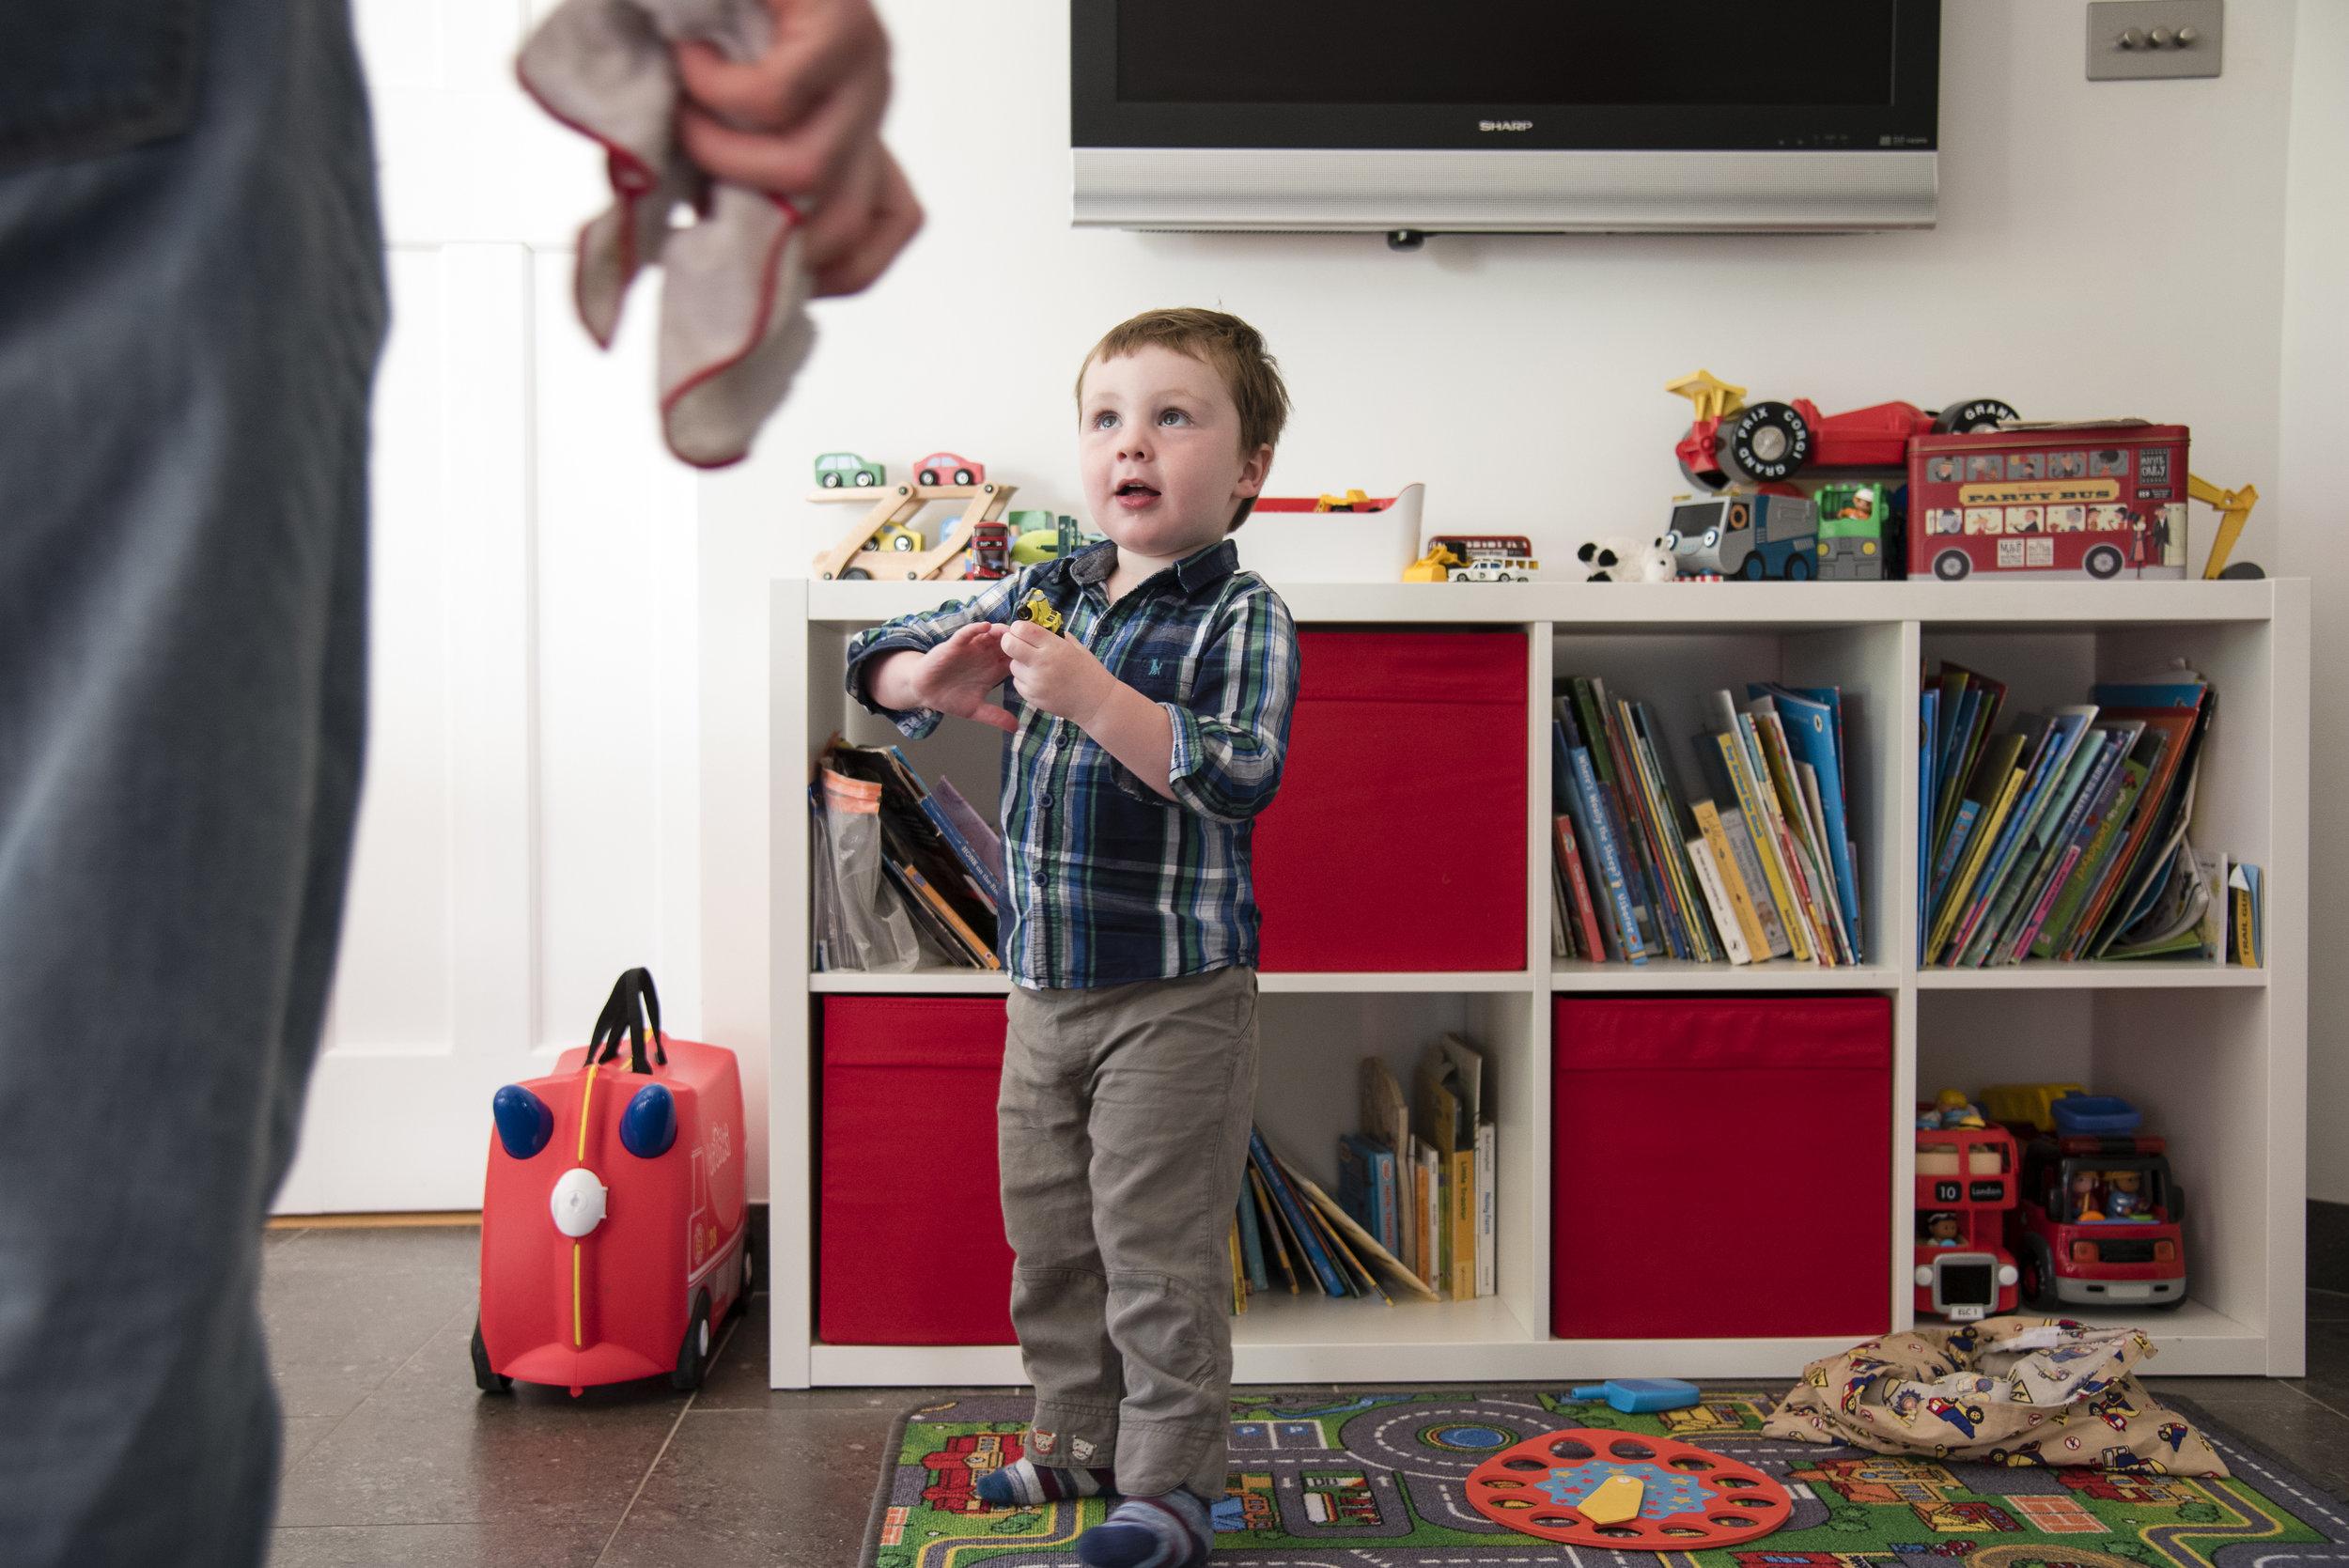 sally-hornung-photography-boy-toy-box.jpg